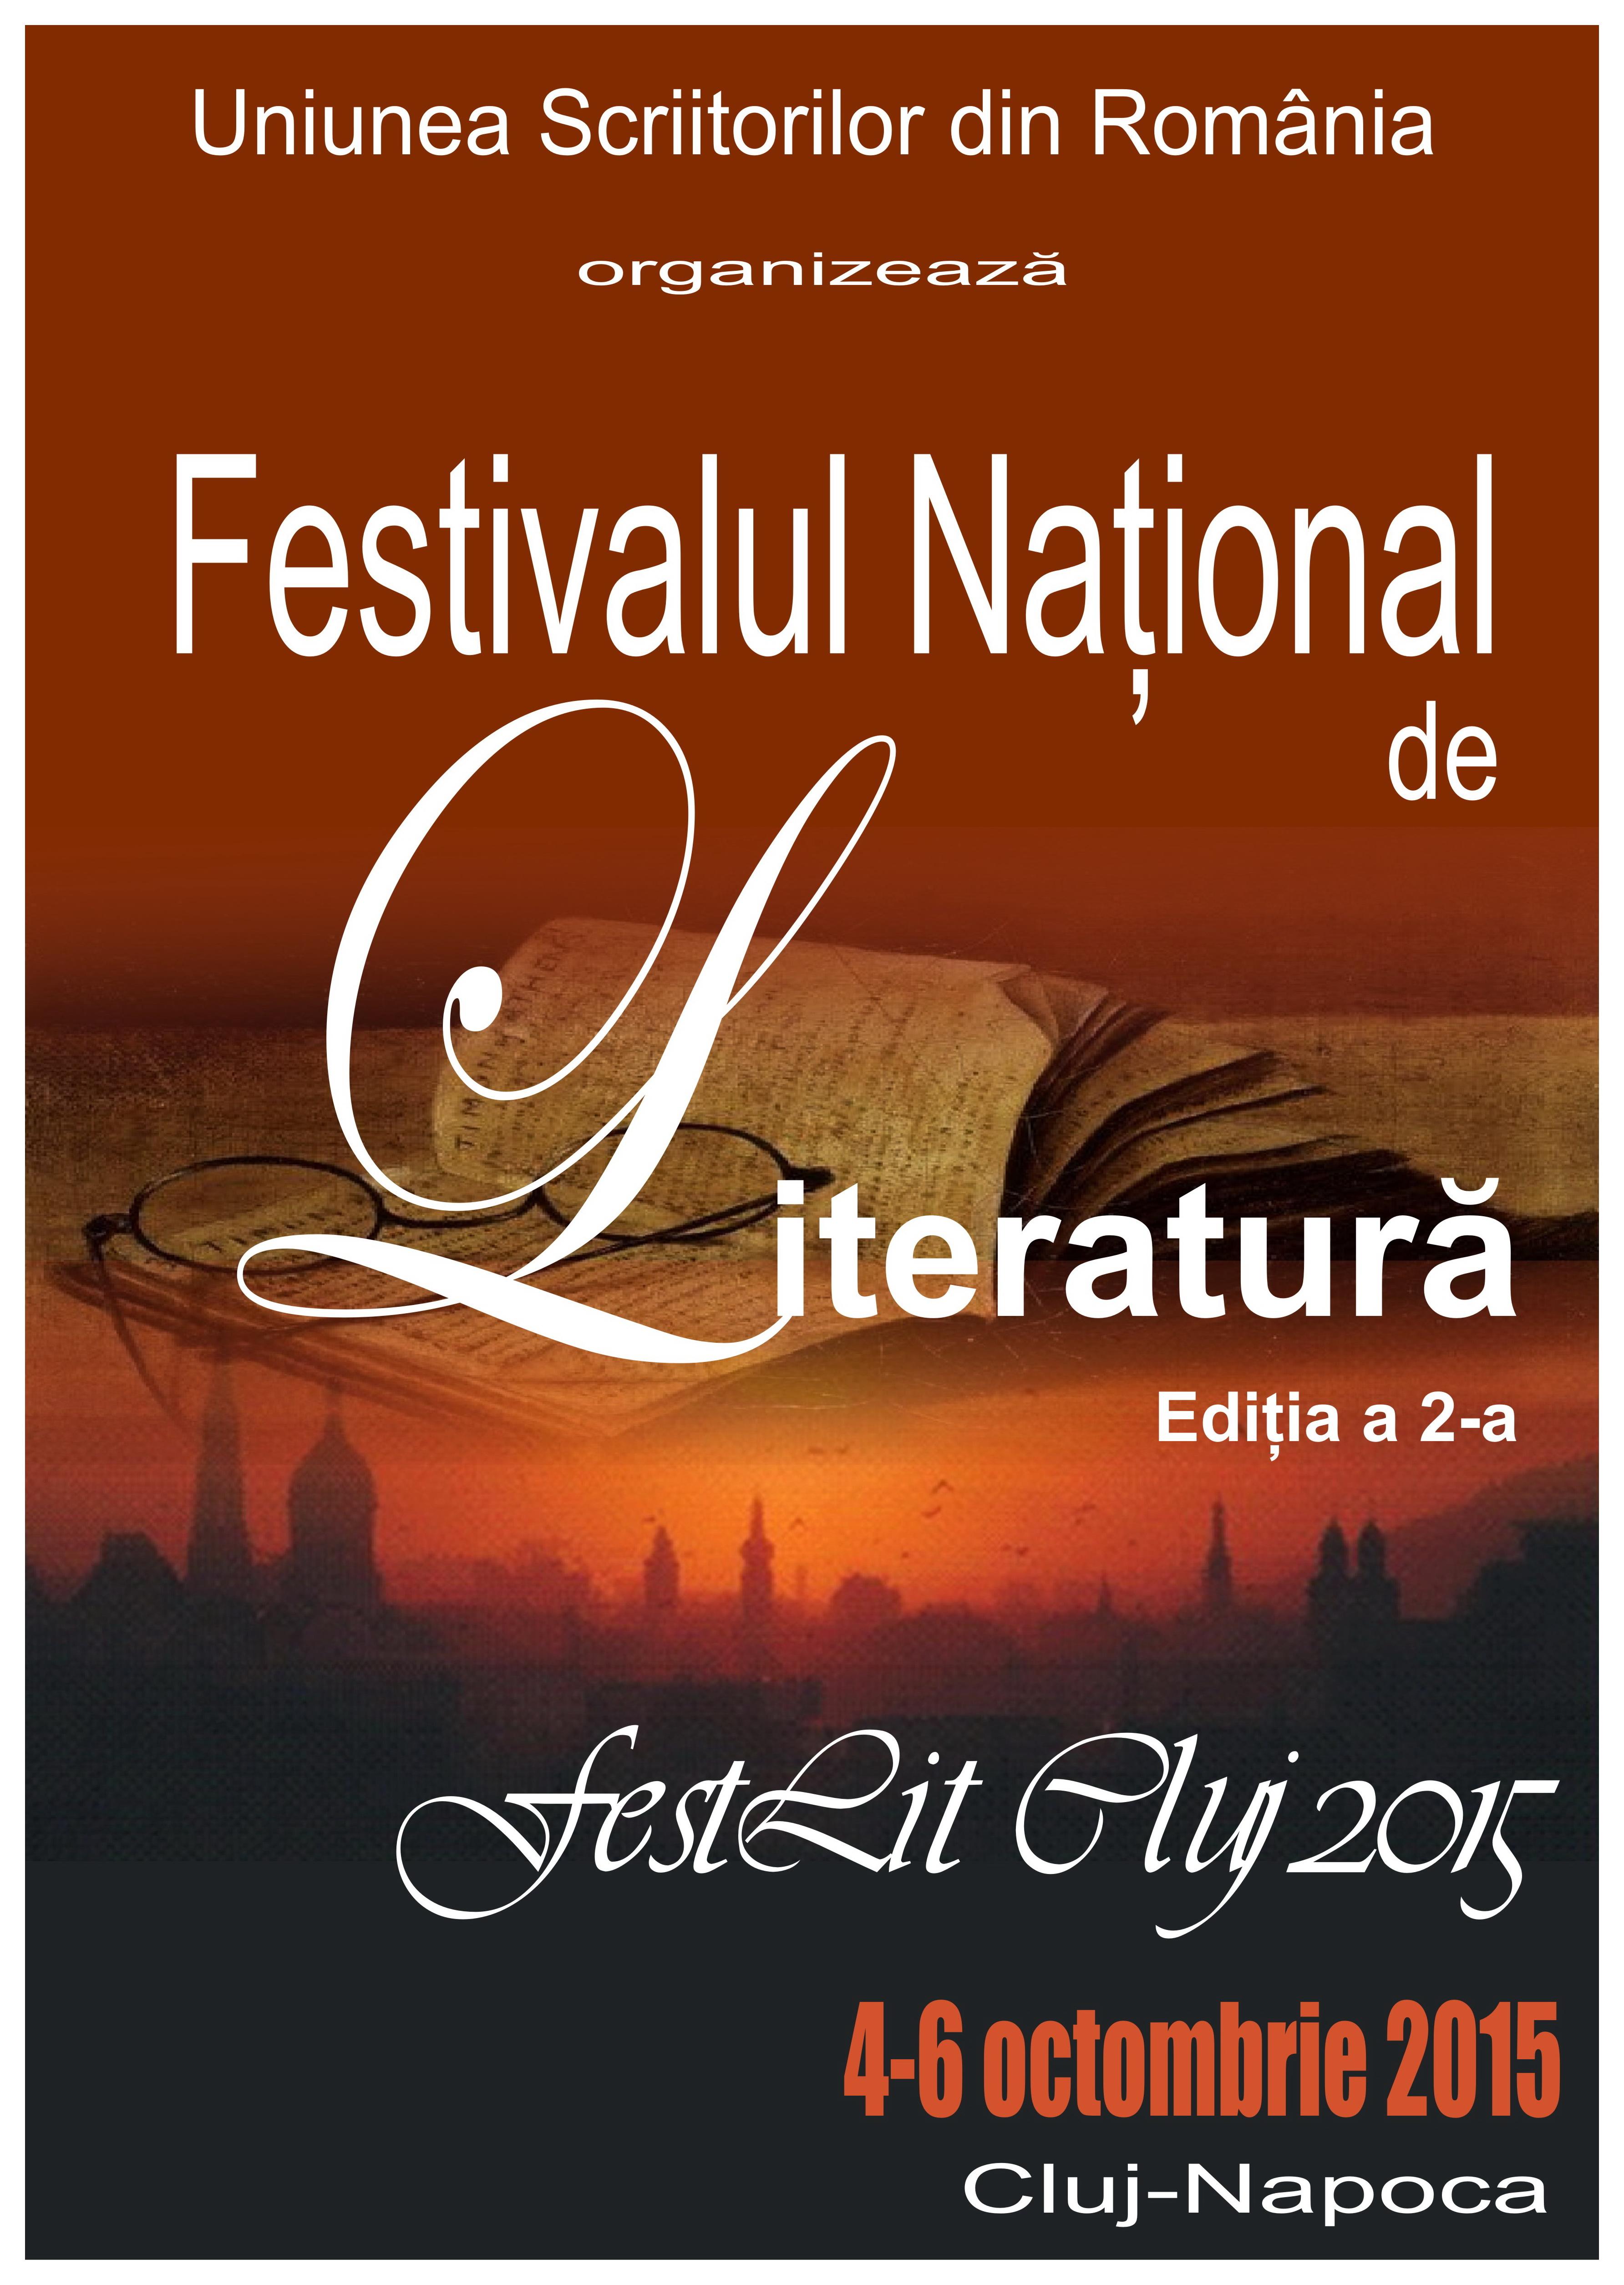 Afis FestLit Cluj f pr  2015